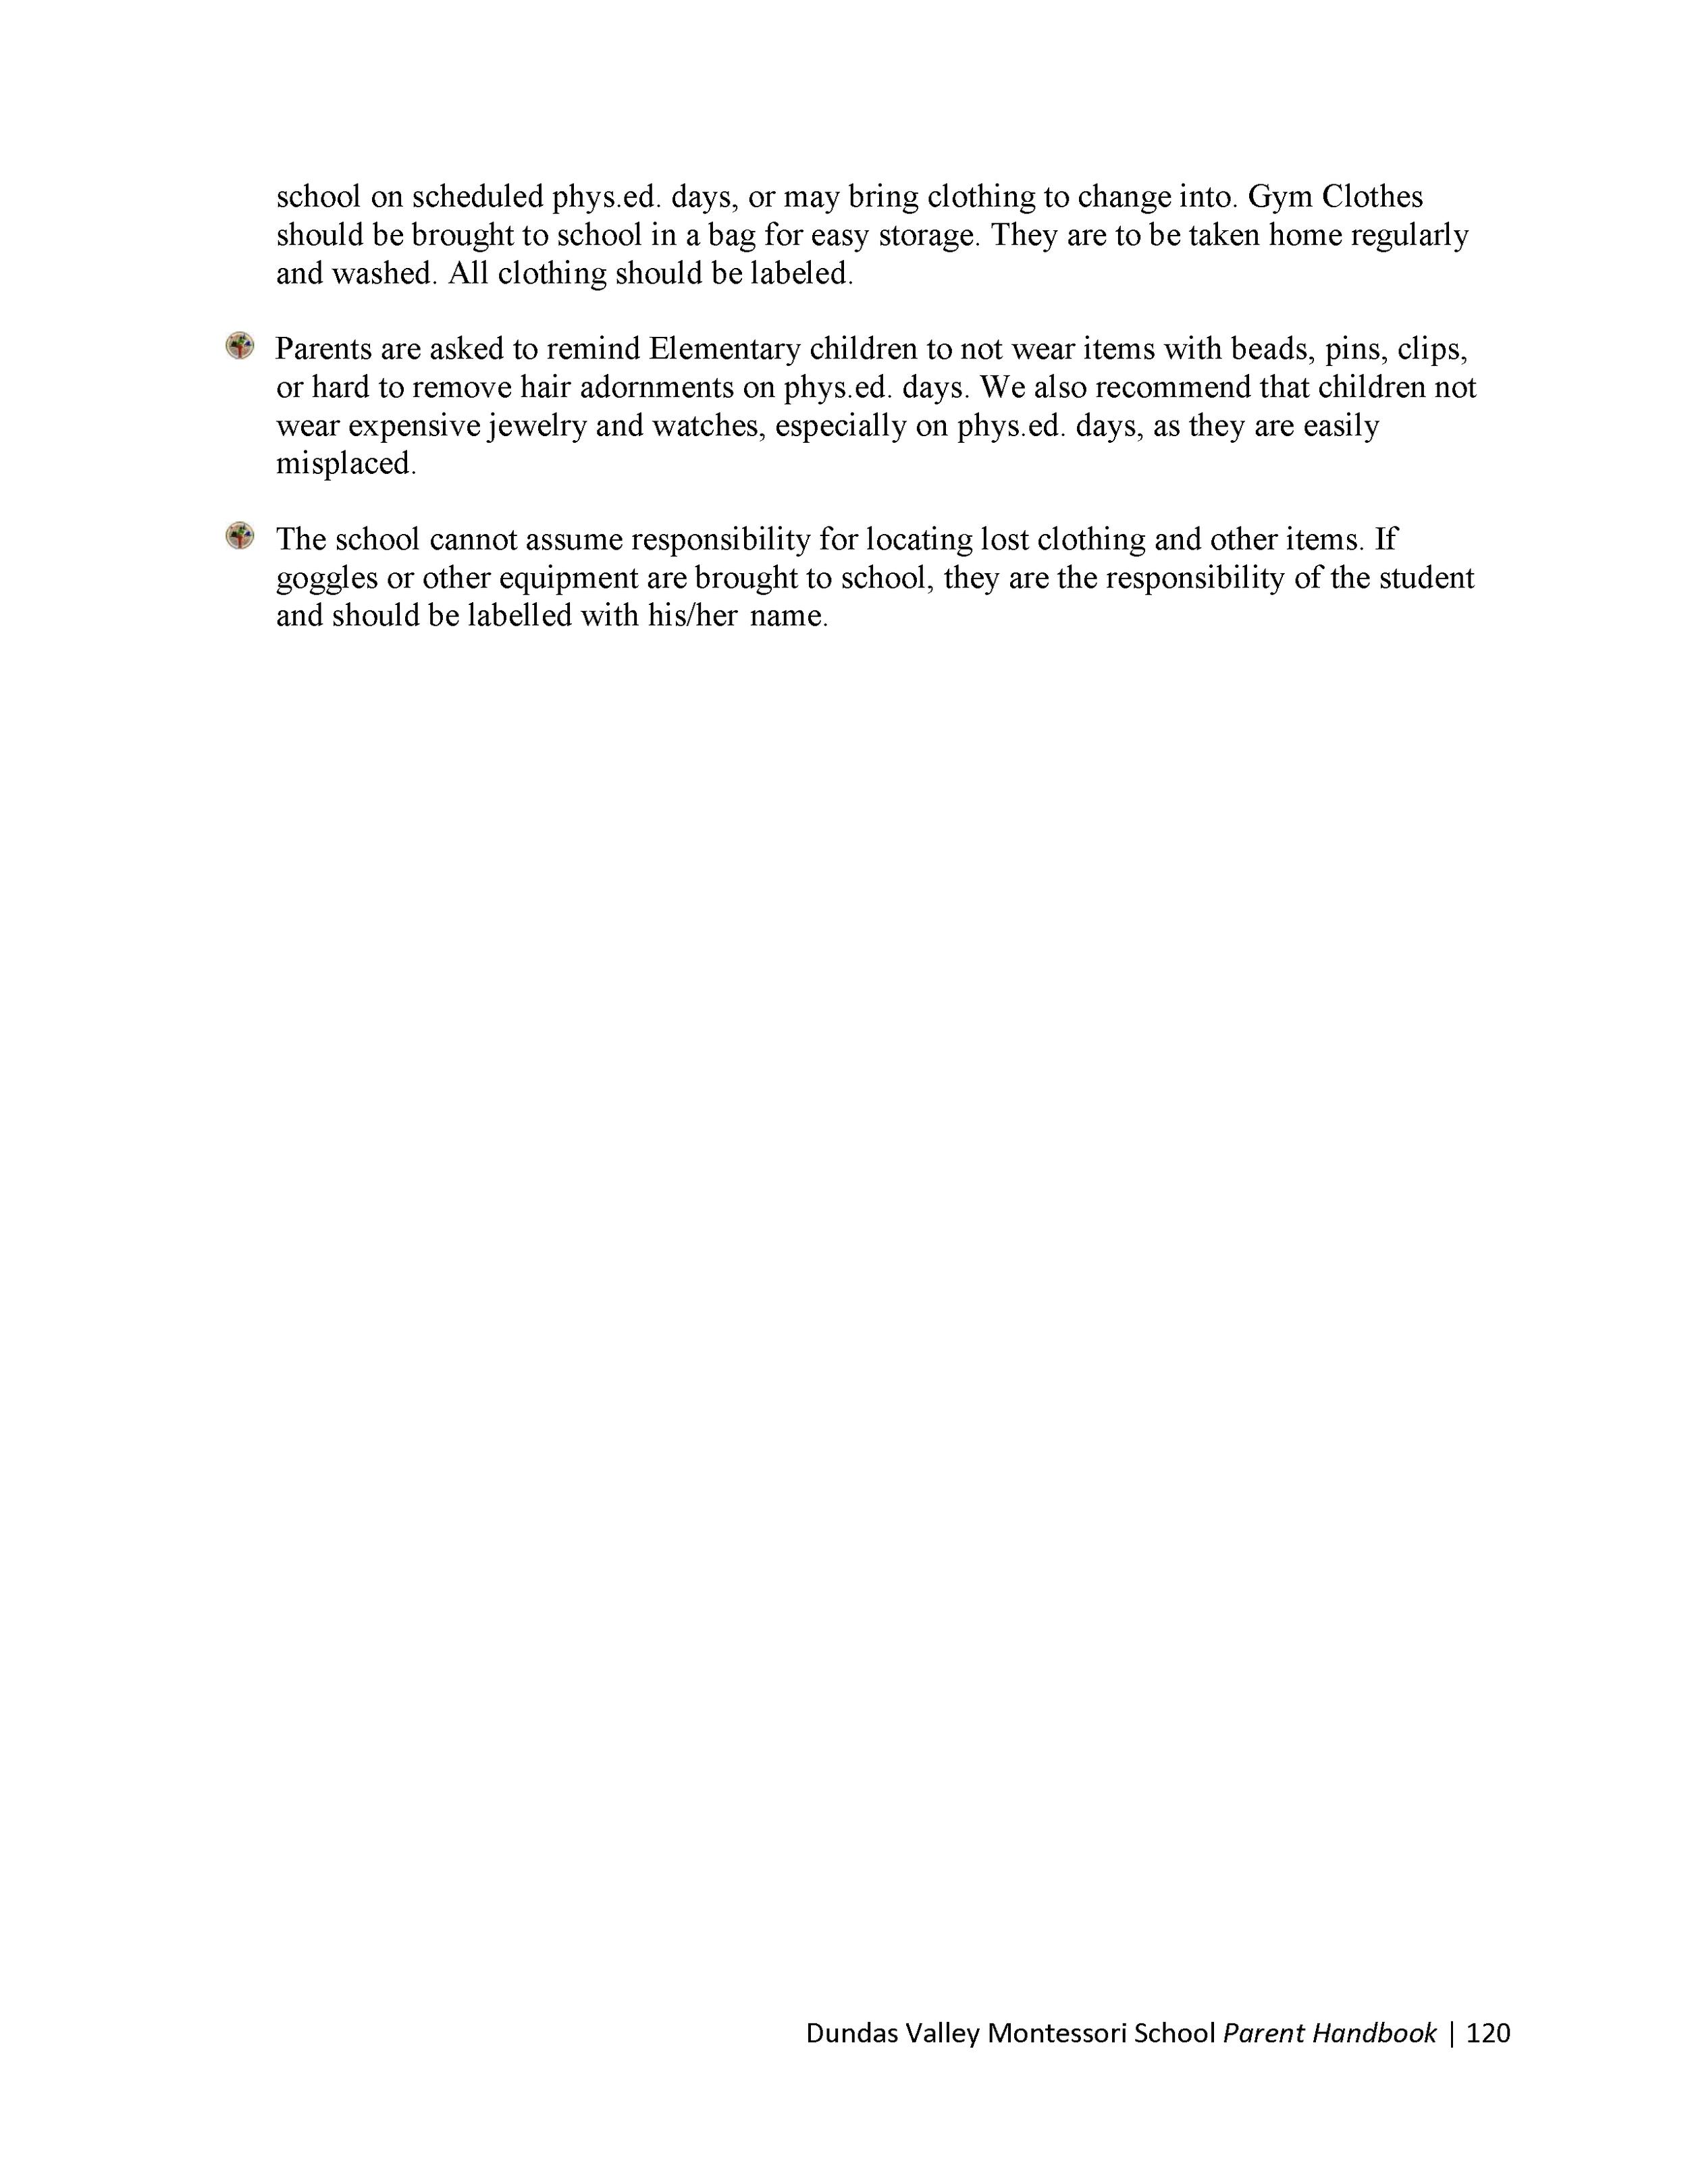 DVMS-Parent-Handbook-19-20_Page_122.png